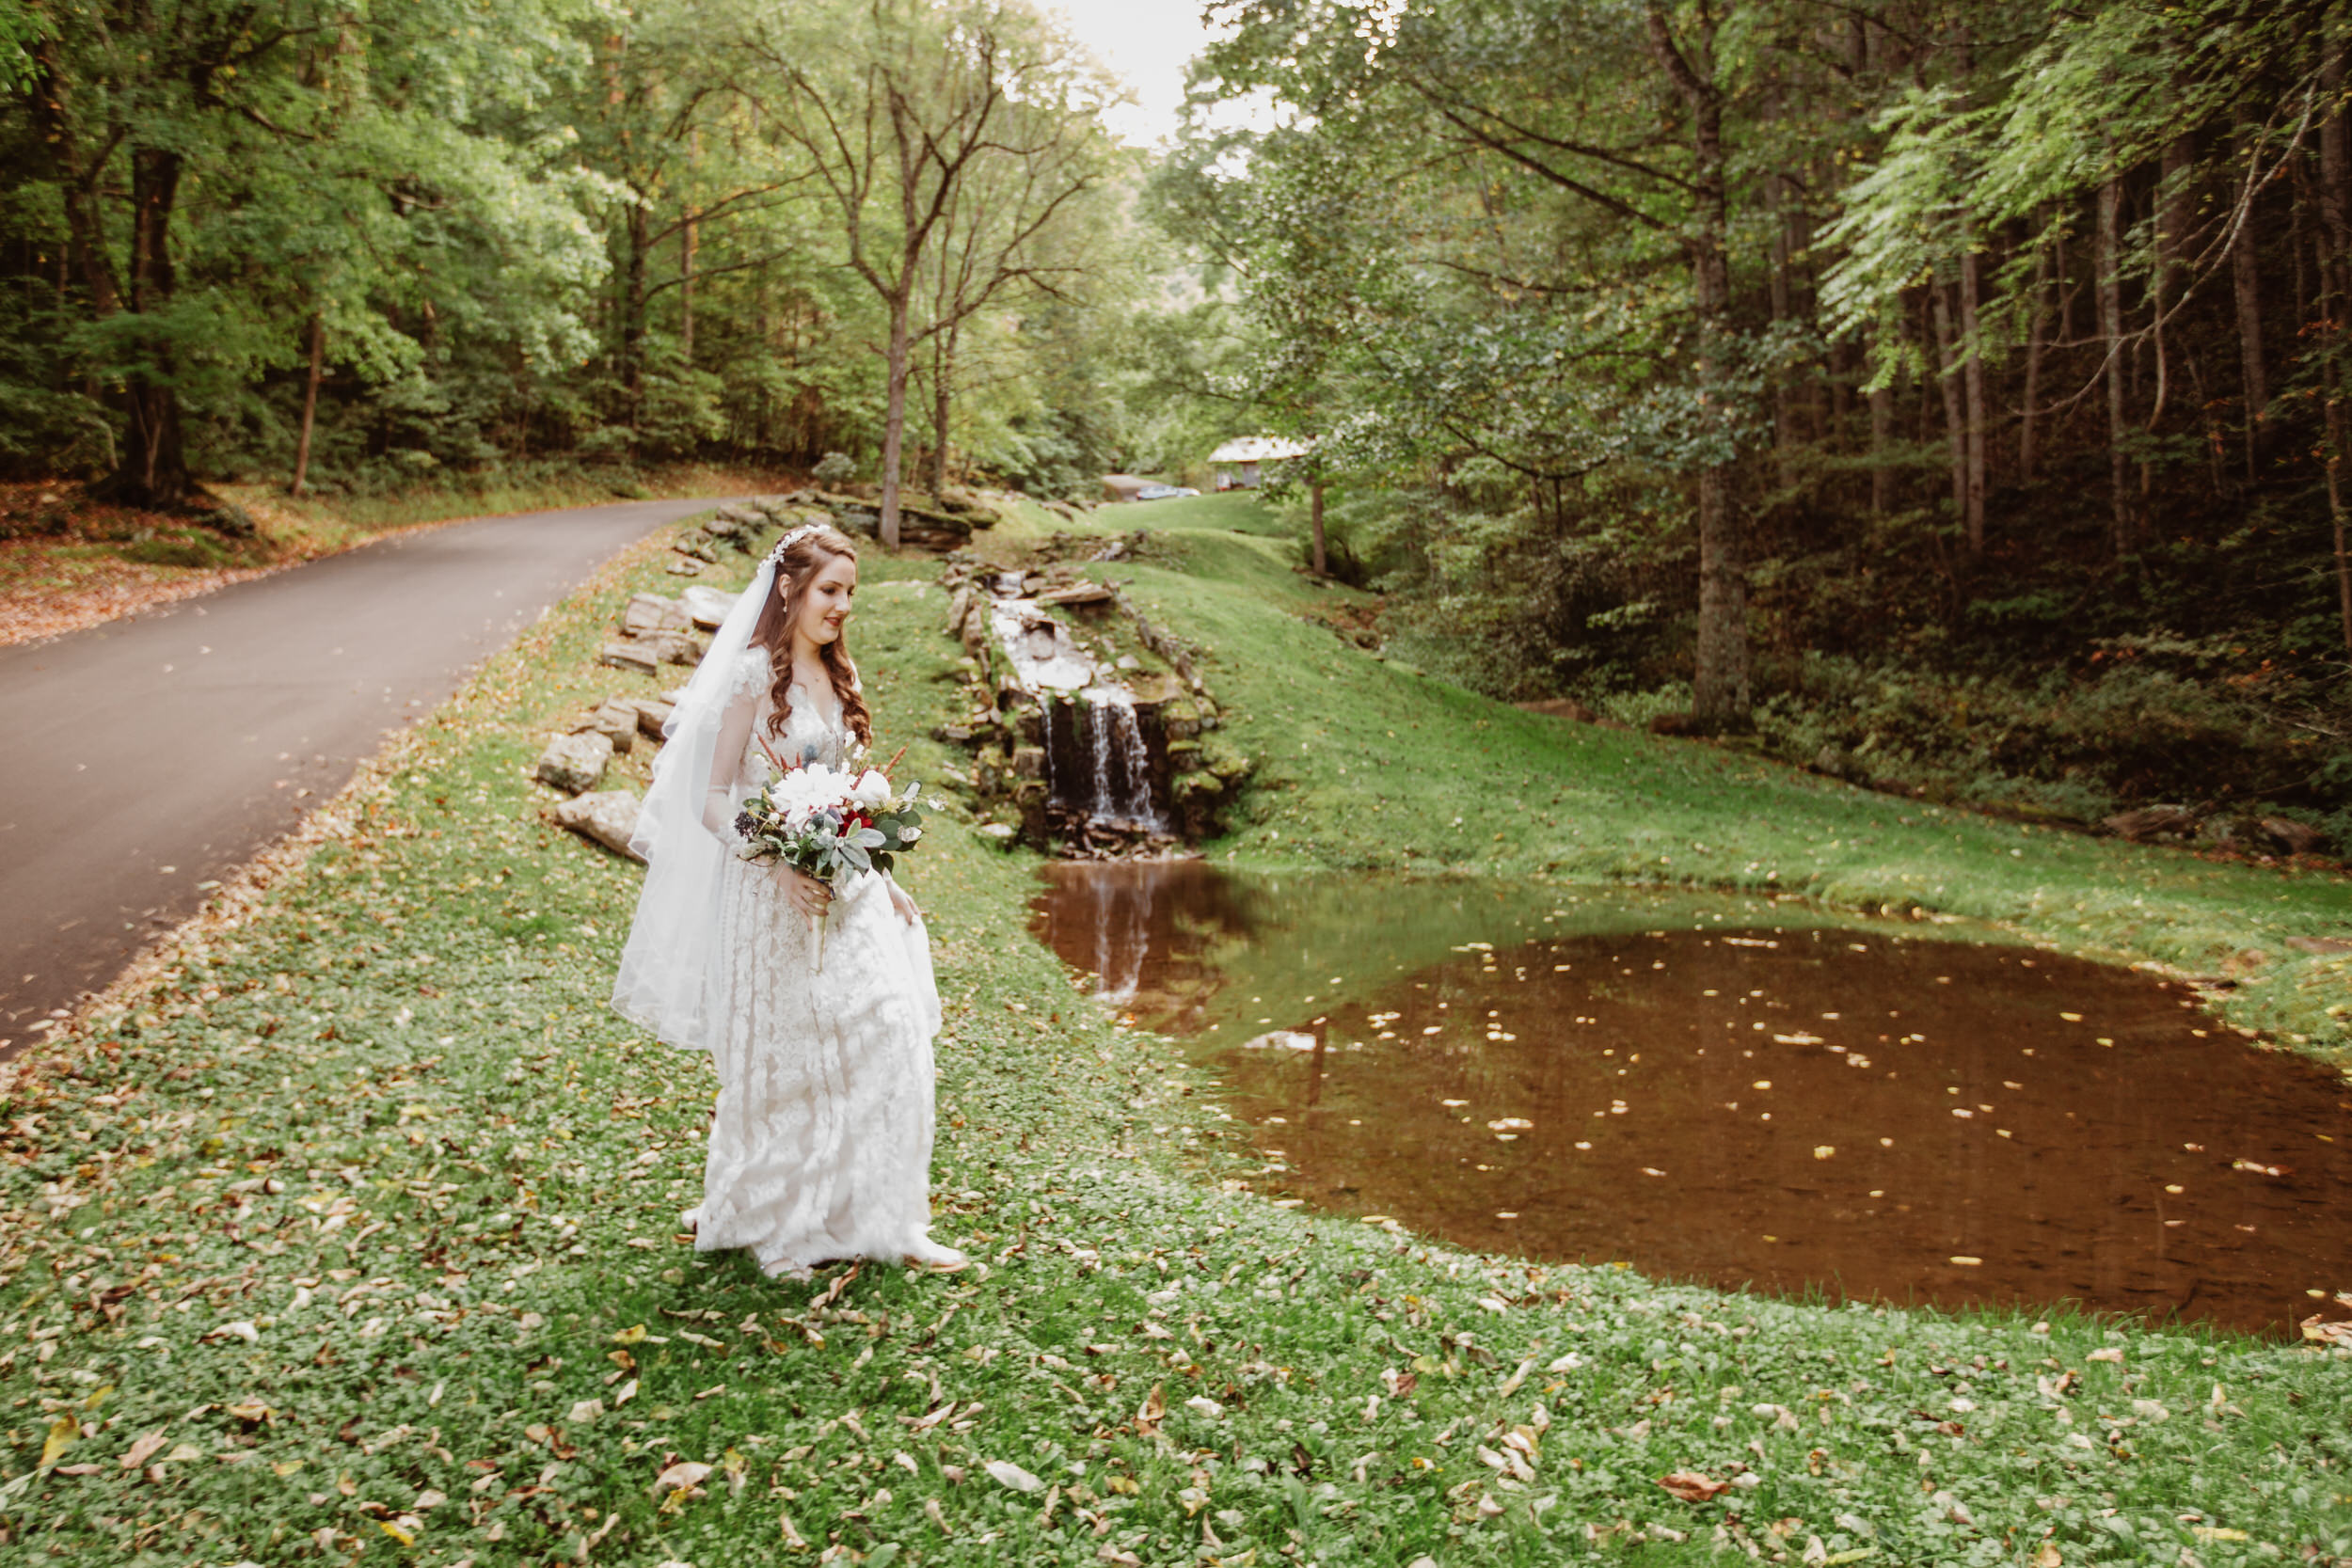 1. Bride's morning- Cole + Rachel's Great Smoky Mountain National Park Elopement-209.jpg